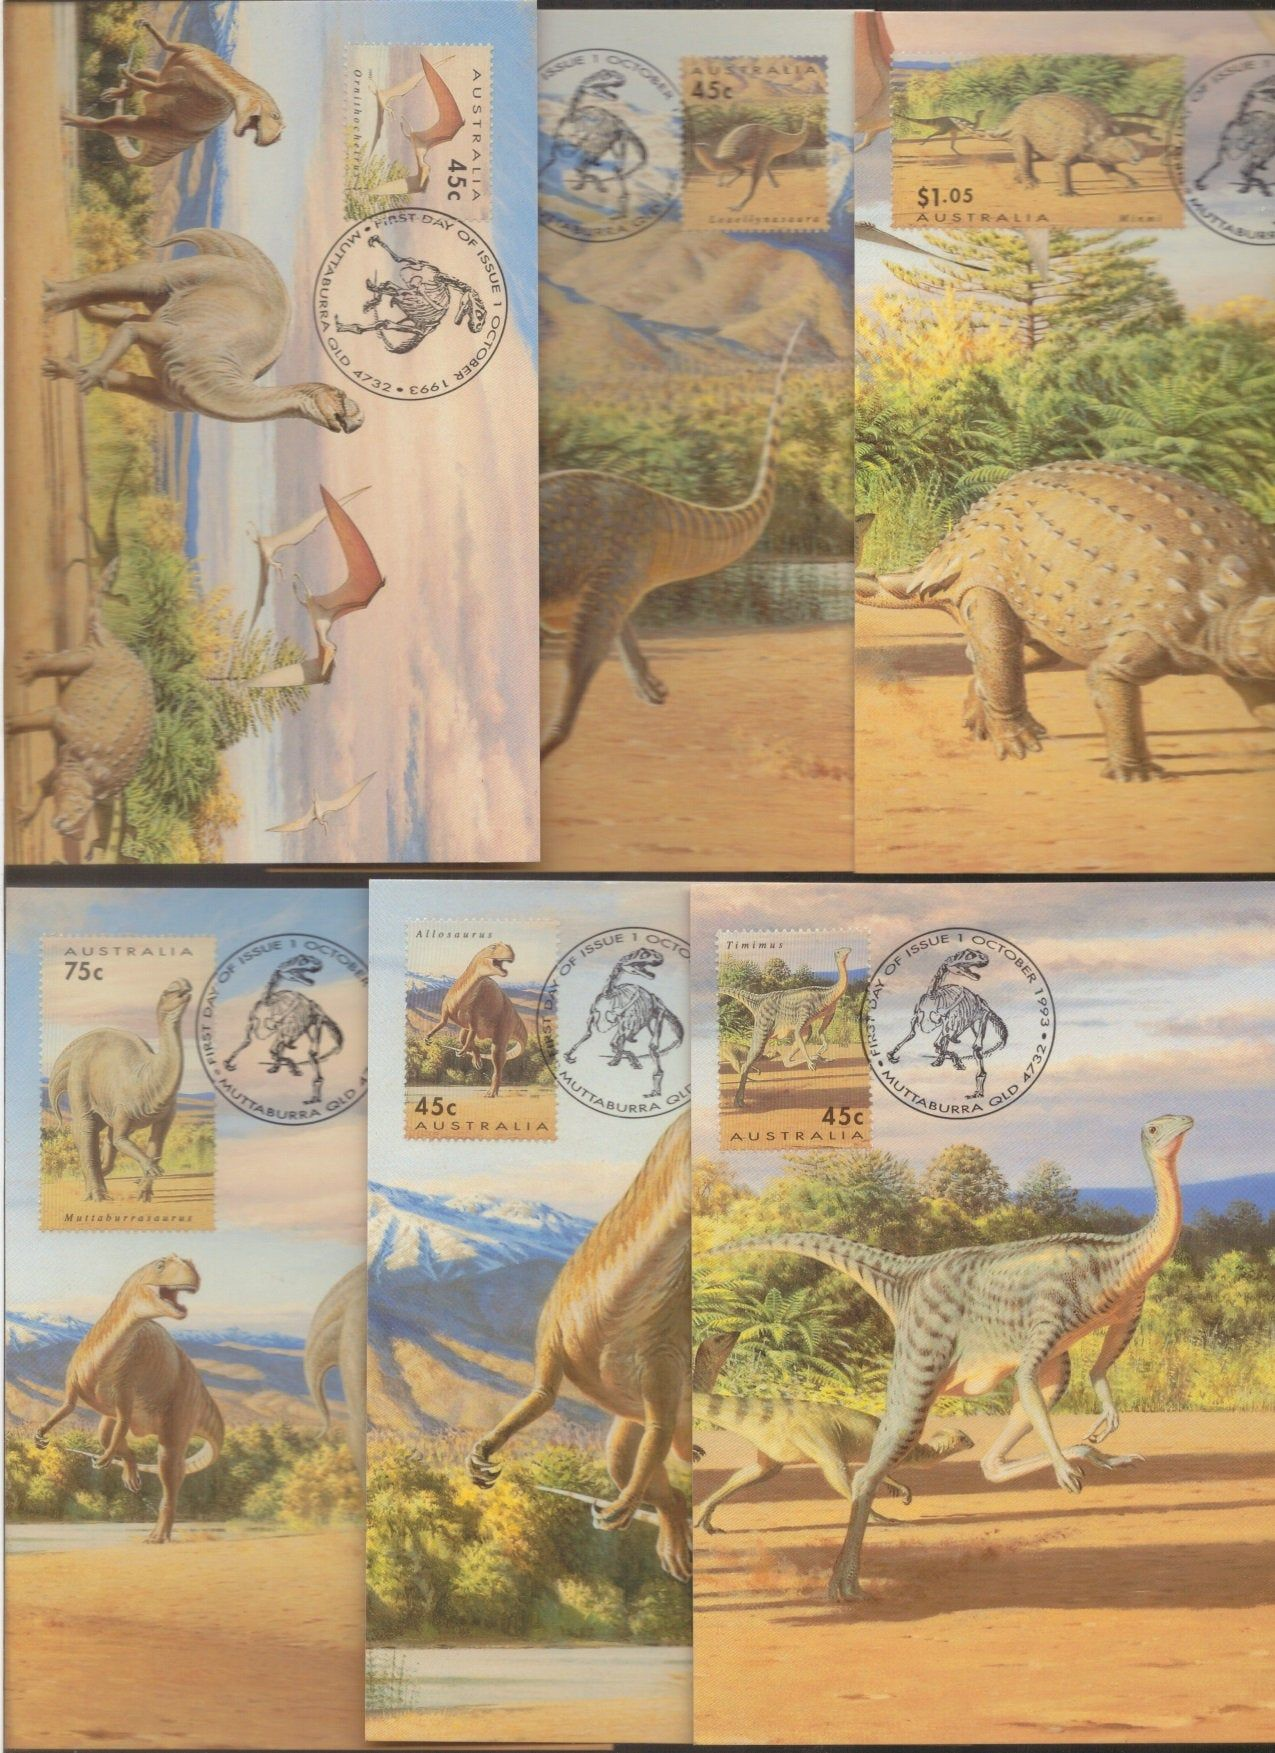 Dinosaurs dinosaur era australia stamp maxi card set of 5